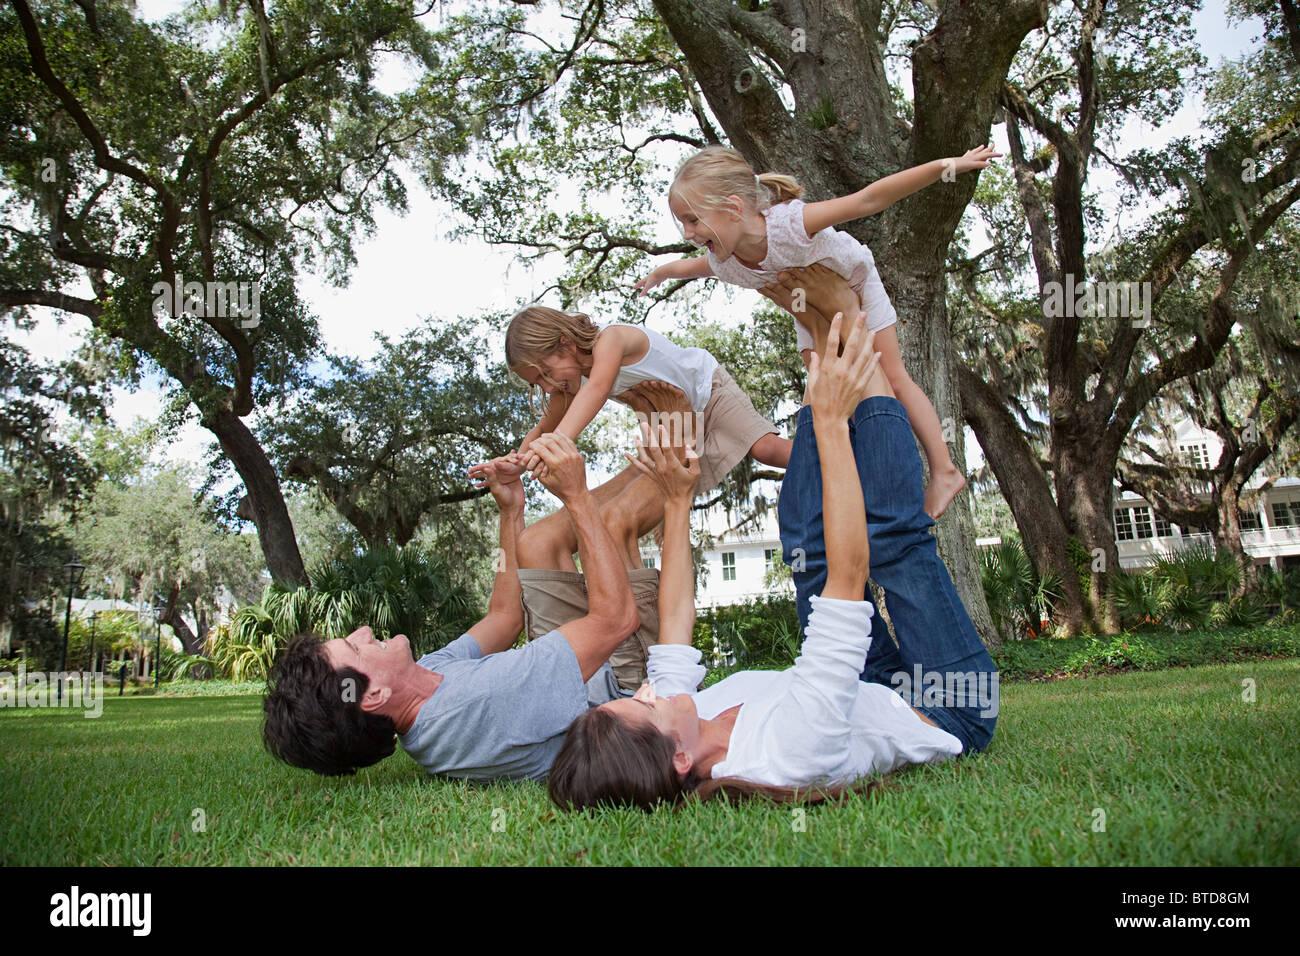 Girls balancing on feet of parents - Stock Image